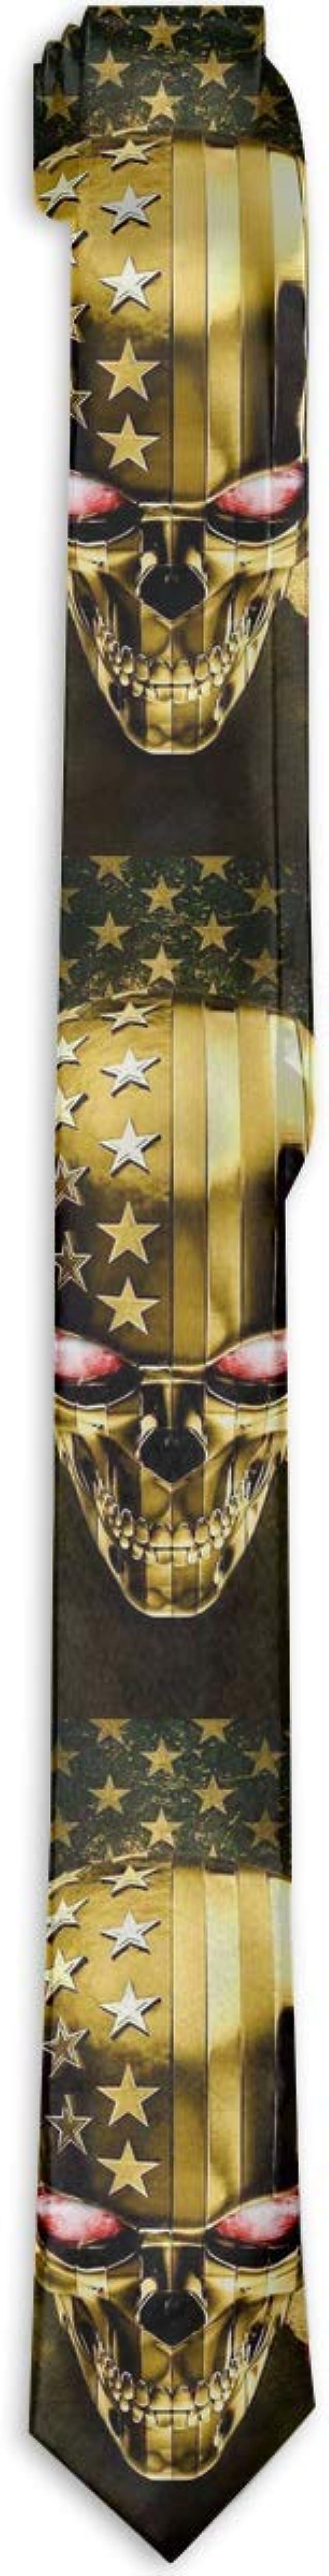 Gold Skull Head USA Flag Corbatas para hombre Novedad Corbata ...